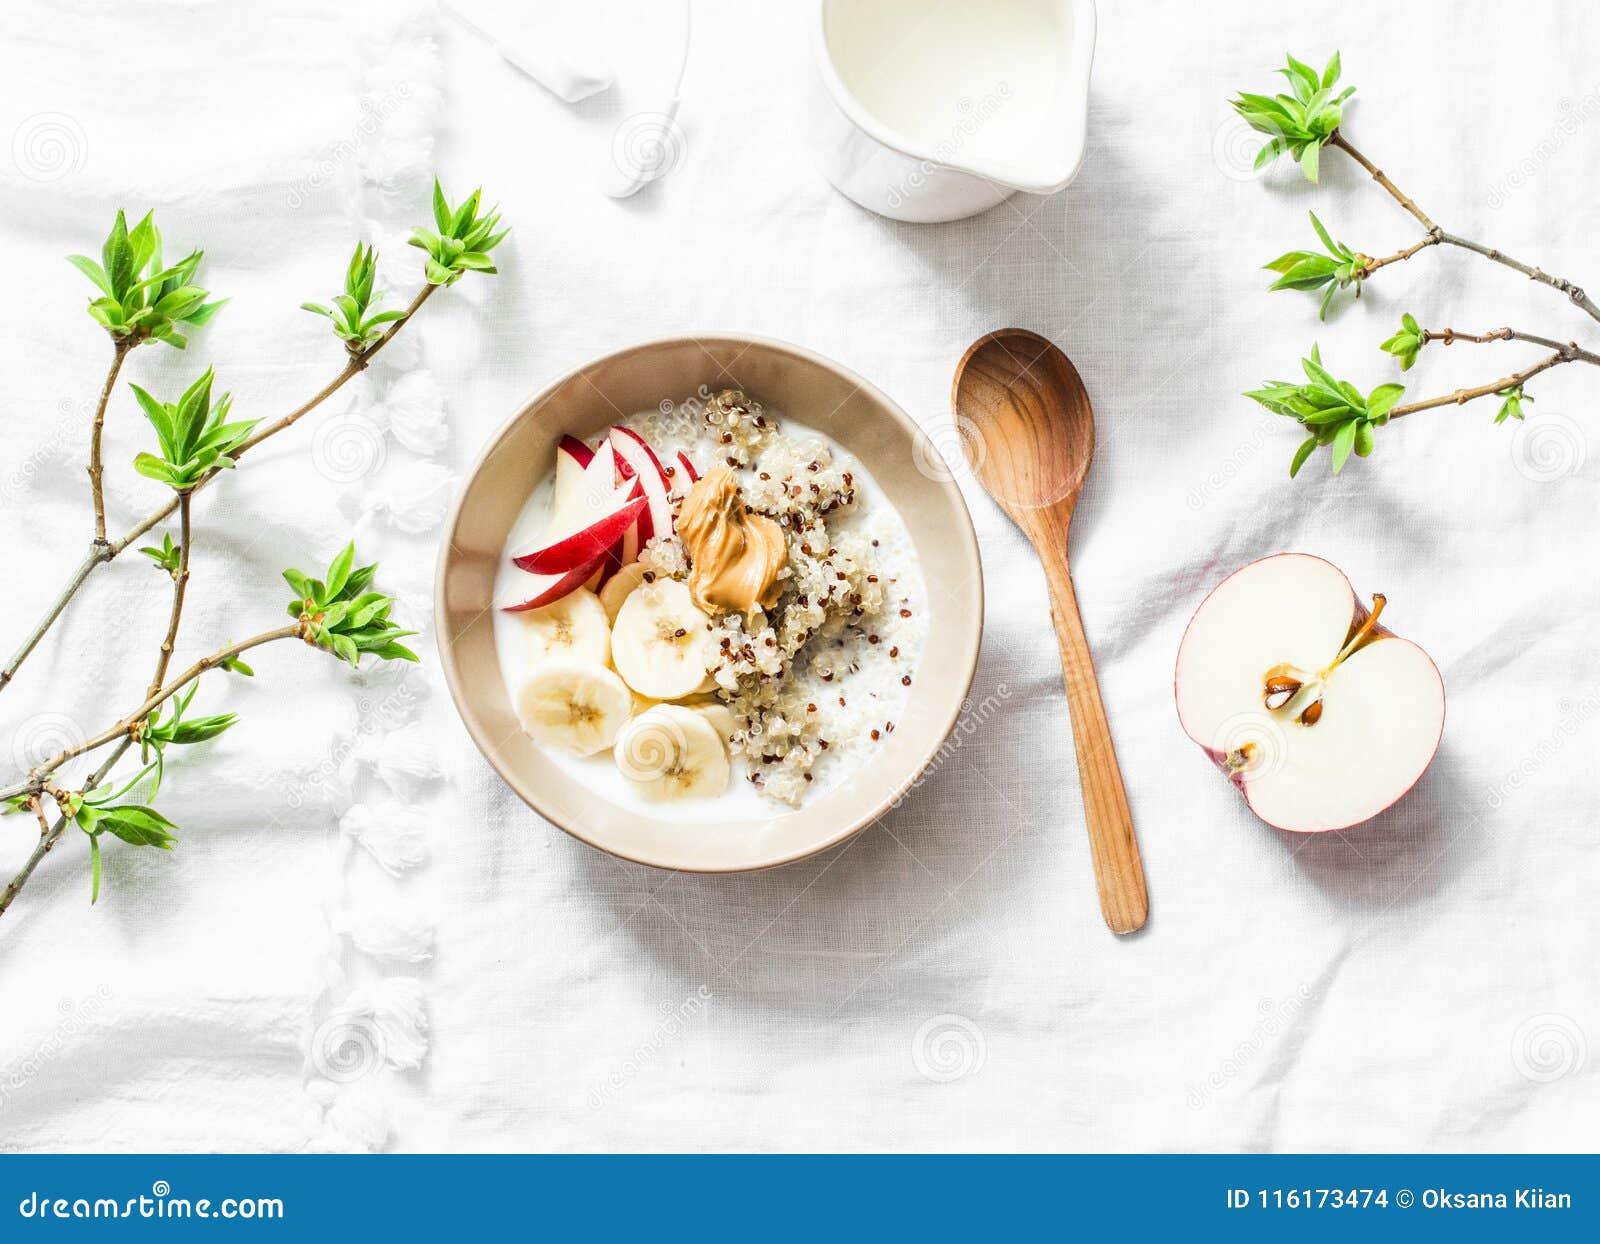 Gluten free breakfast - quinoa, coconut milk, banana, apple, peanut butter bowl on light background, top view. Delicious diet, veg